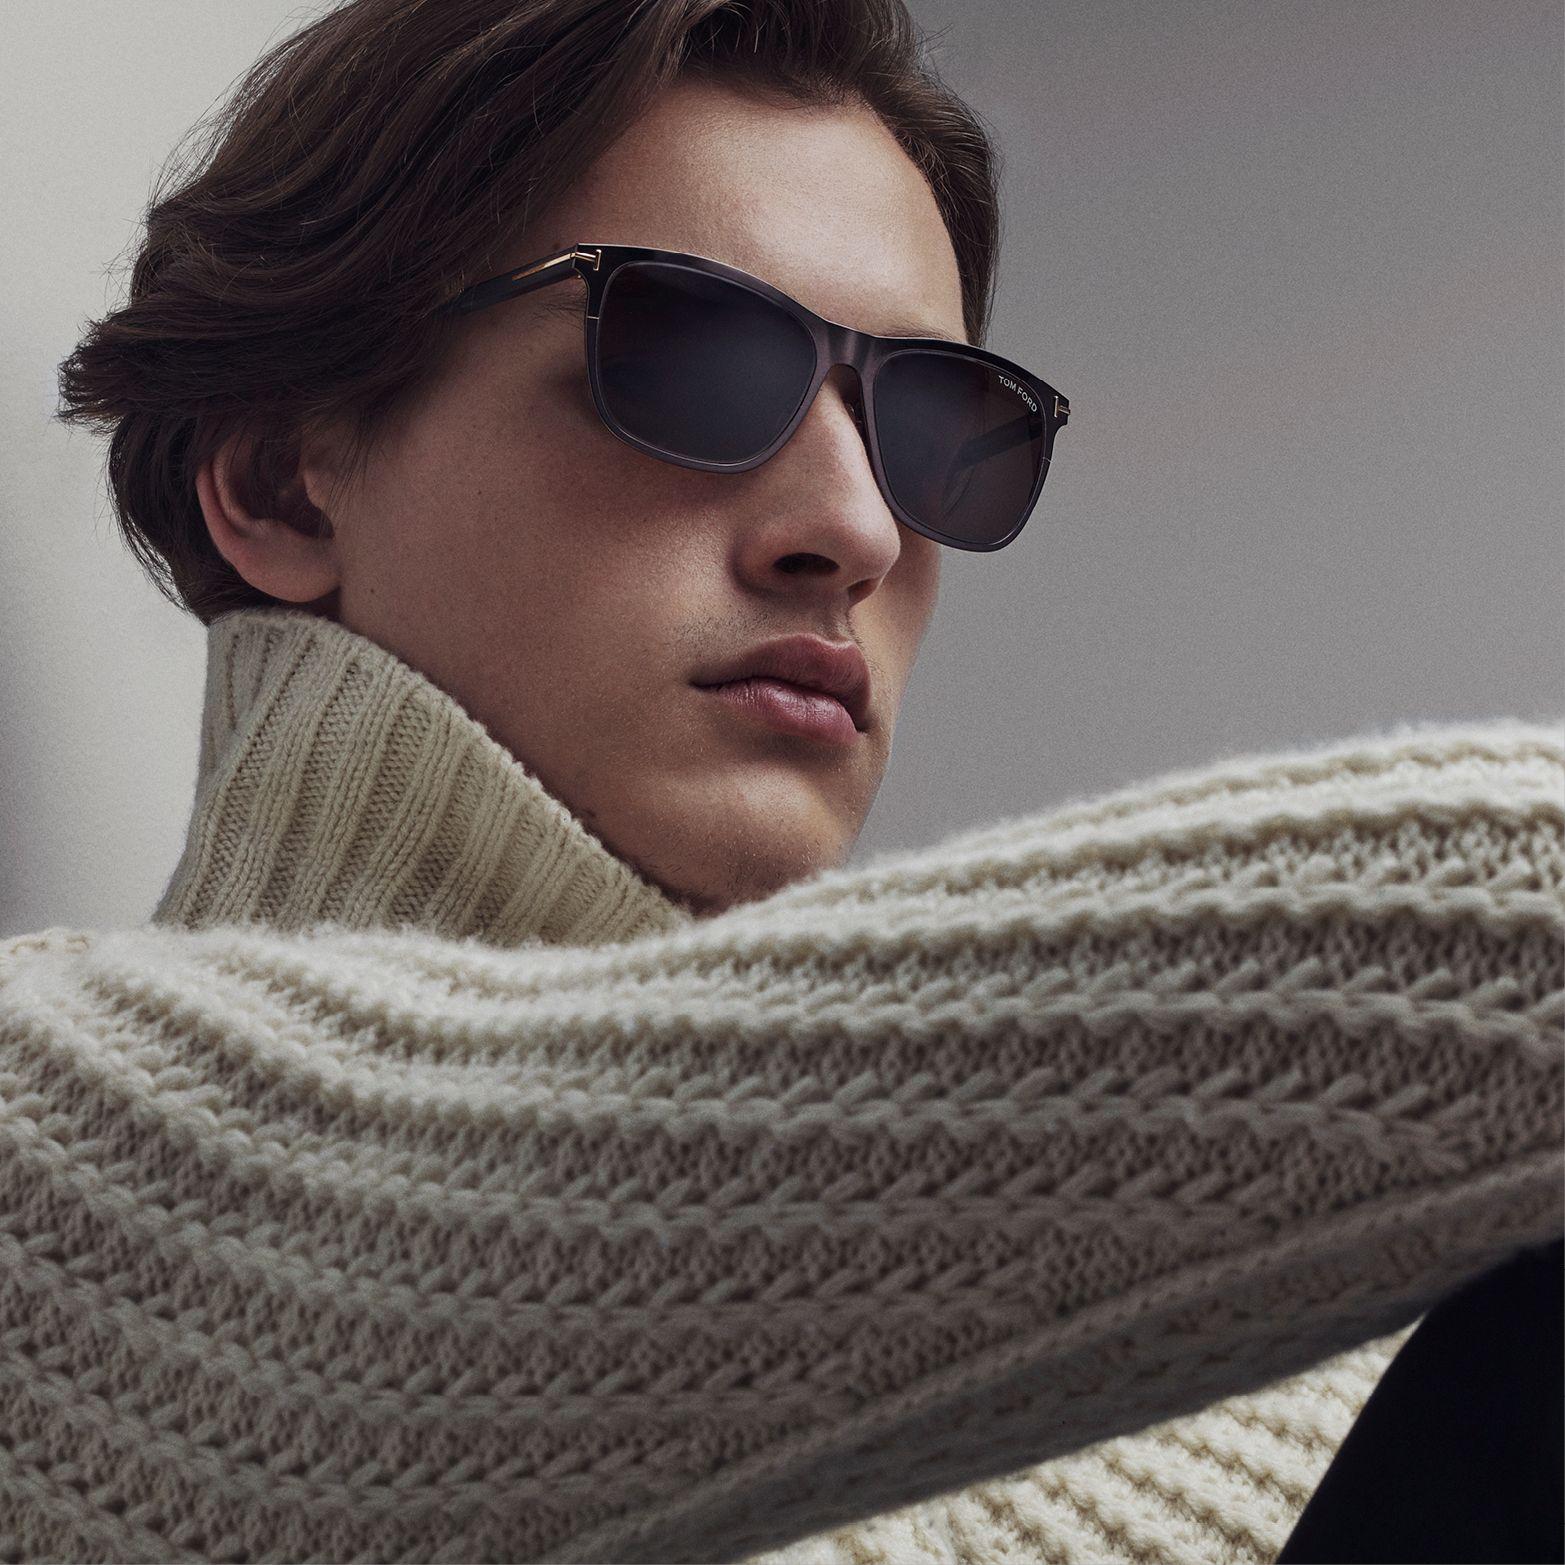 9f5c669a6 Matte Black Alasdhair Sunglasses. #TOMFORD Sunglasses Women Designer, Men  Sunglasses Fashion, Tom